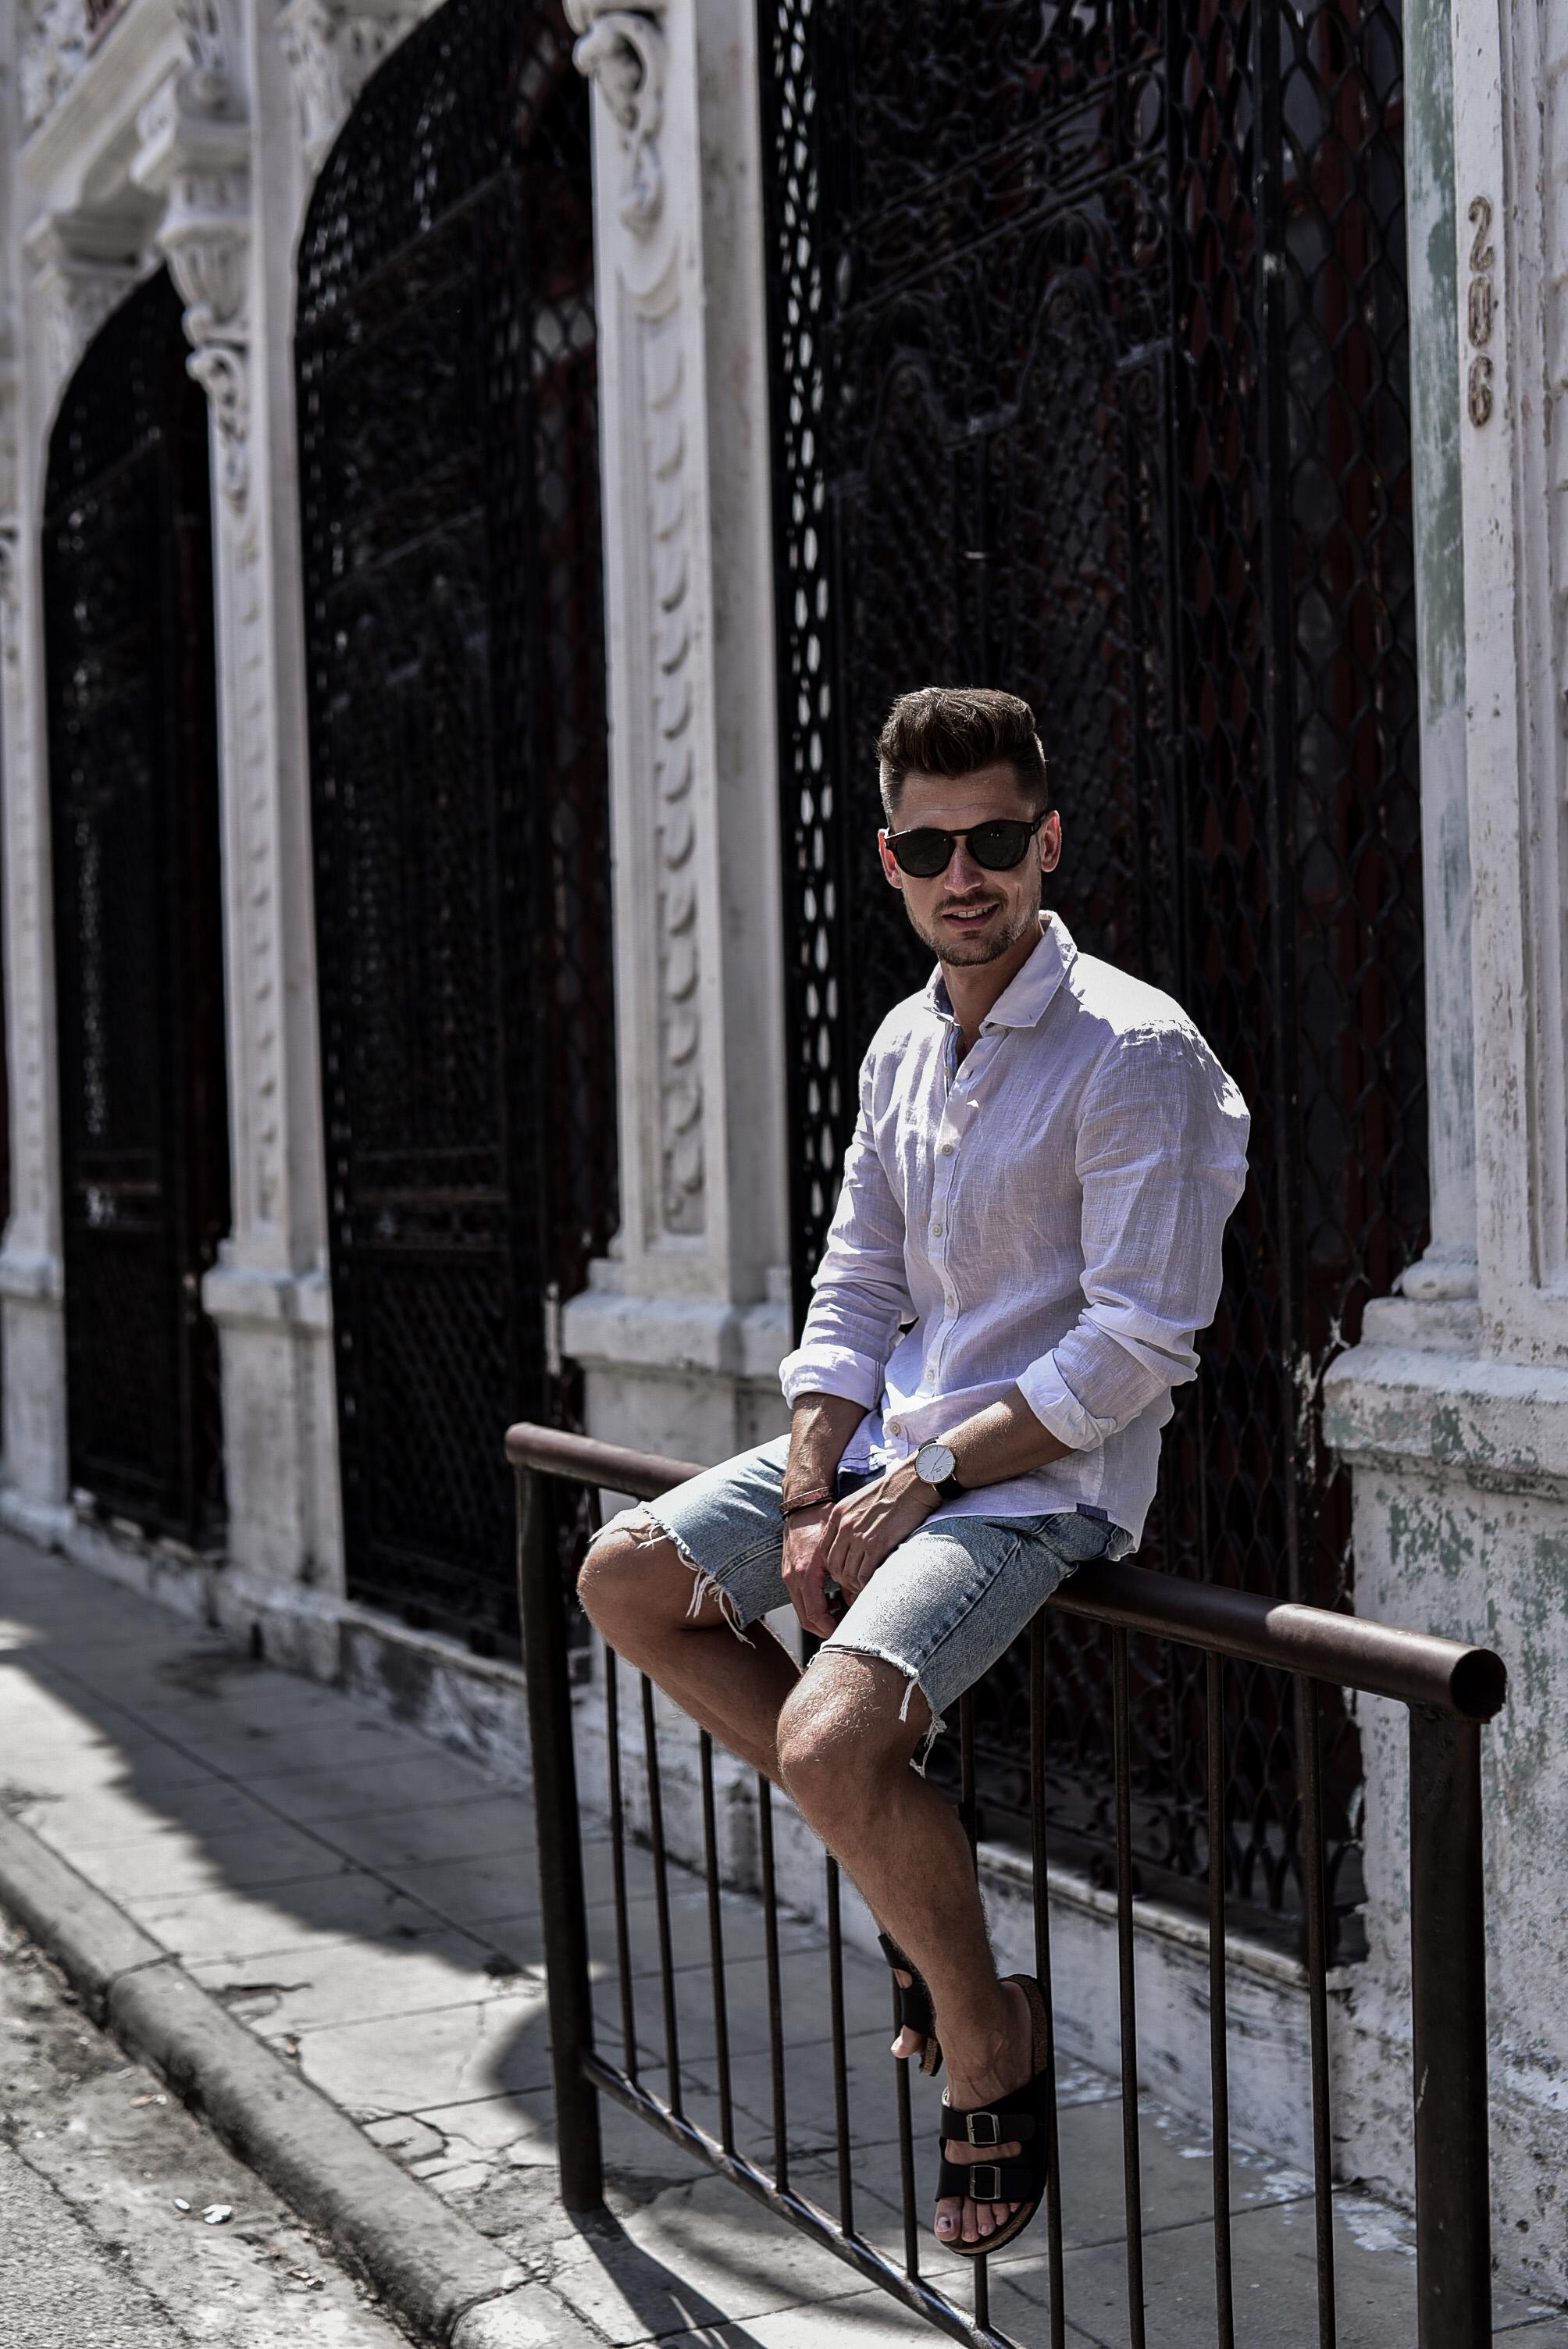 Tommeezjerry-Maennermodeblog-Maennermode-Fashionblog-Styleblog-Berlinblog--Lifestyleblog-Olymp-Hemden-Havana-Cuba-Outfit-Casual-Chic